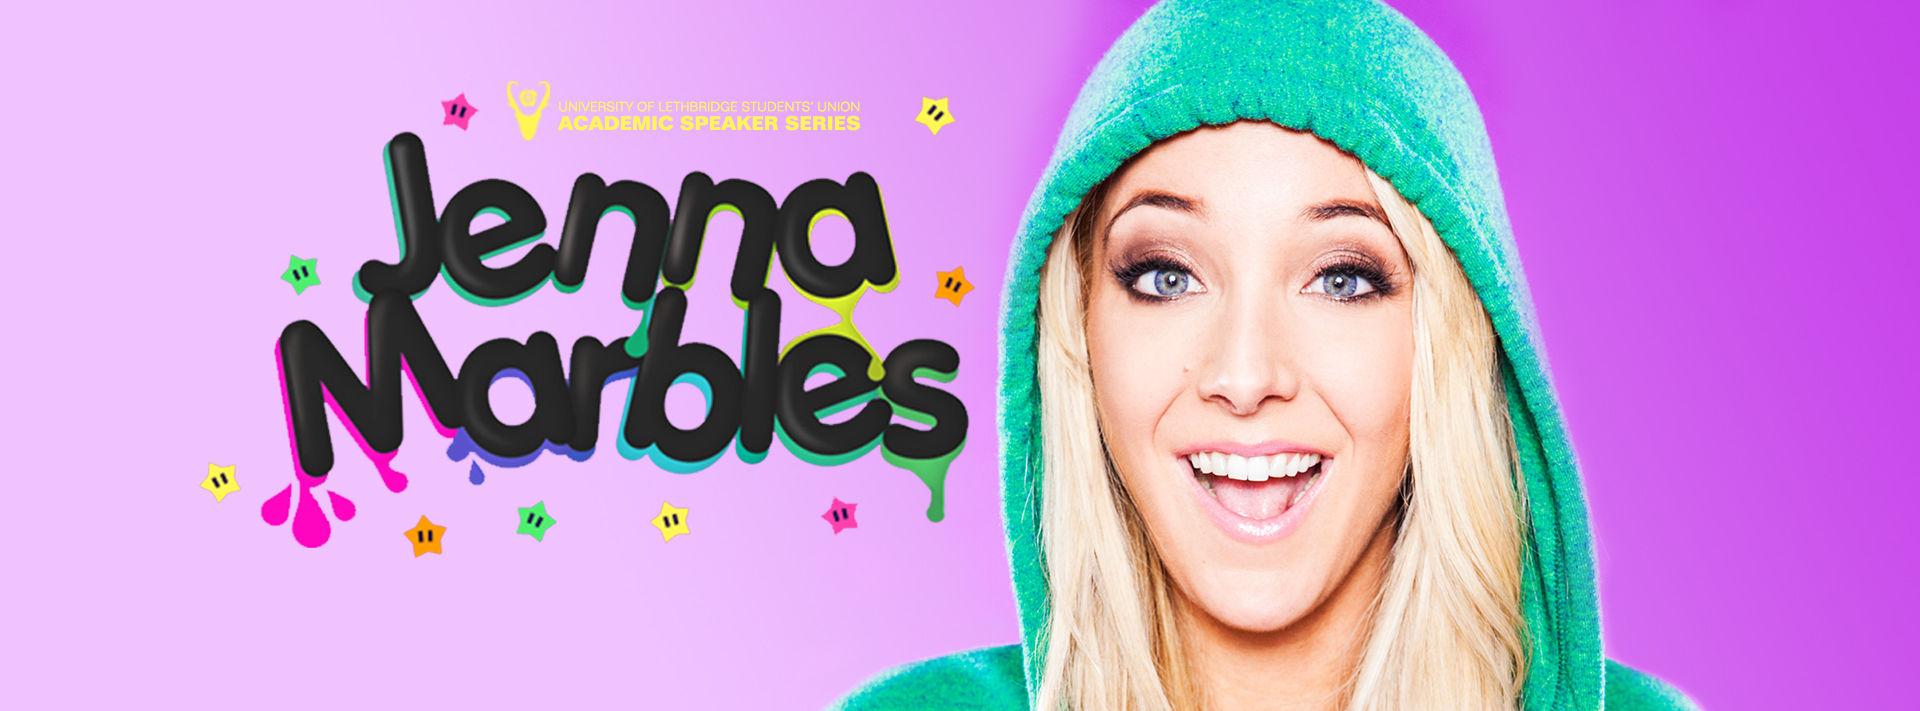 Jenna Marbles | Events.ulsu.ca